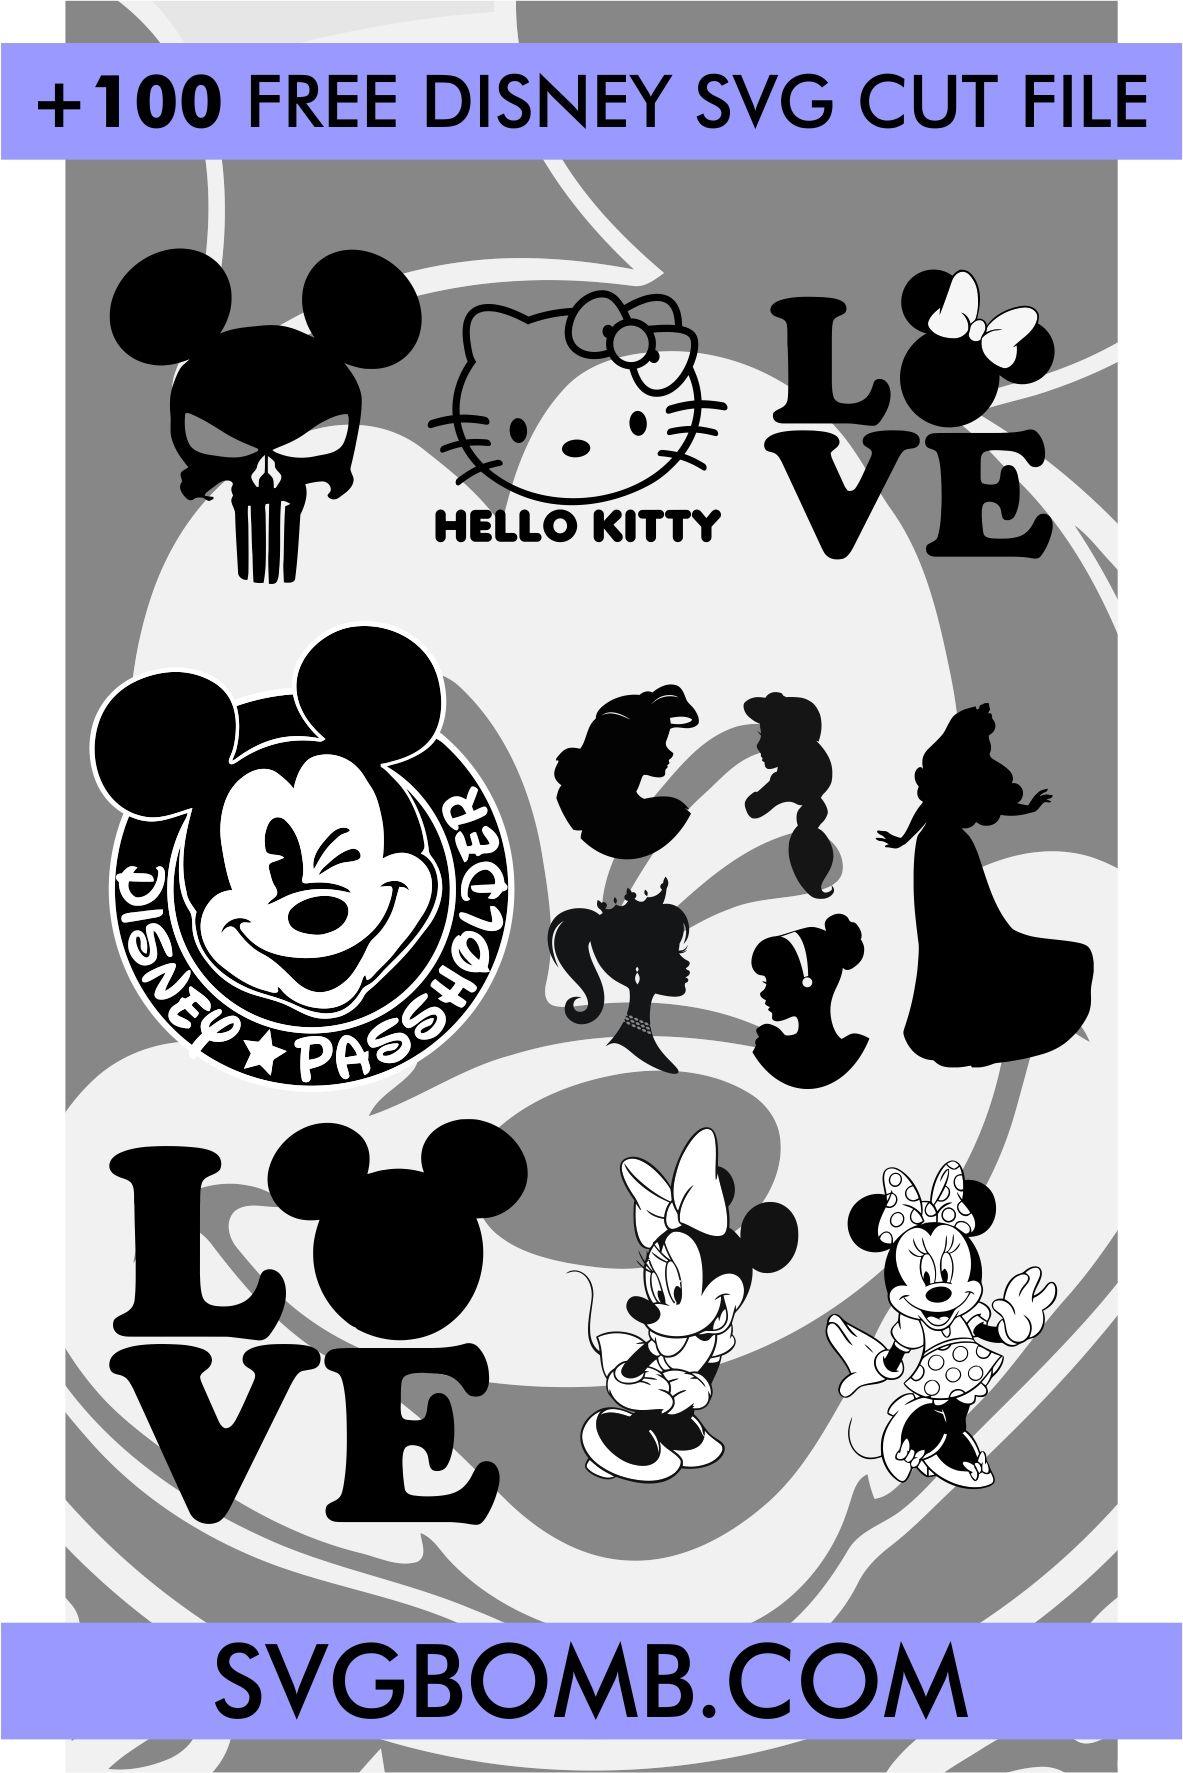 Disney Cricut Free Cricut Svg Files Free Cricut Svg